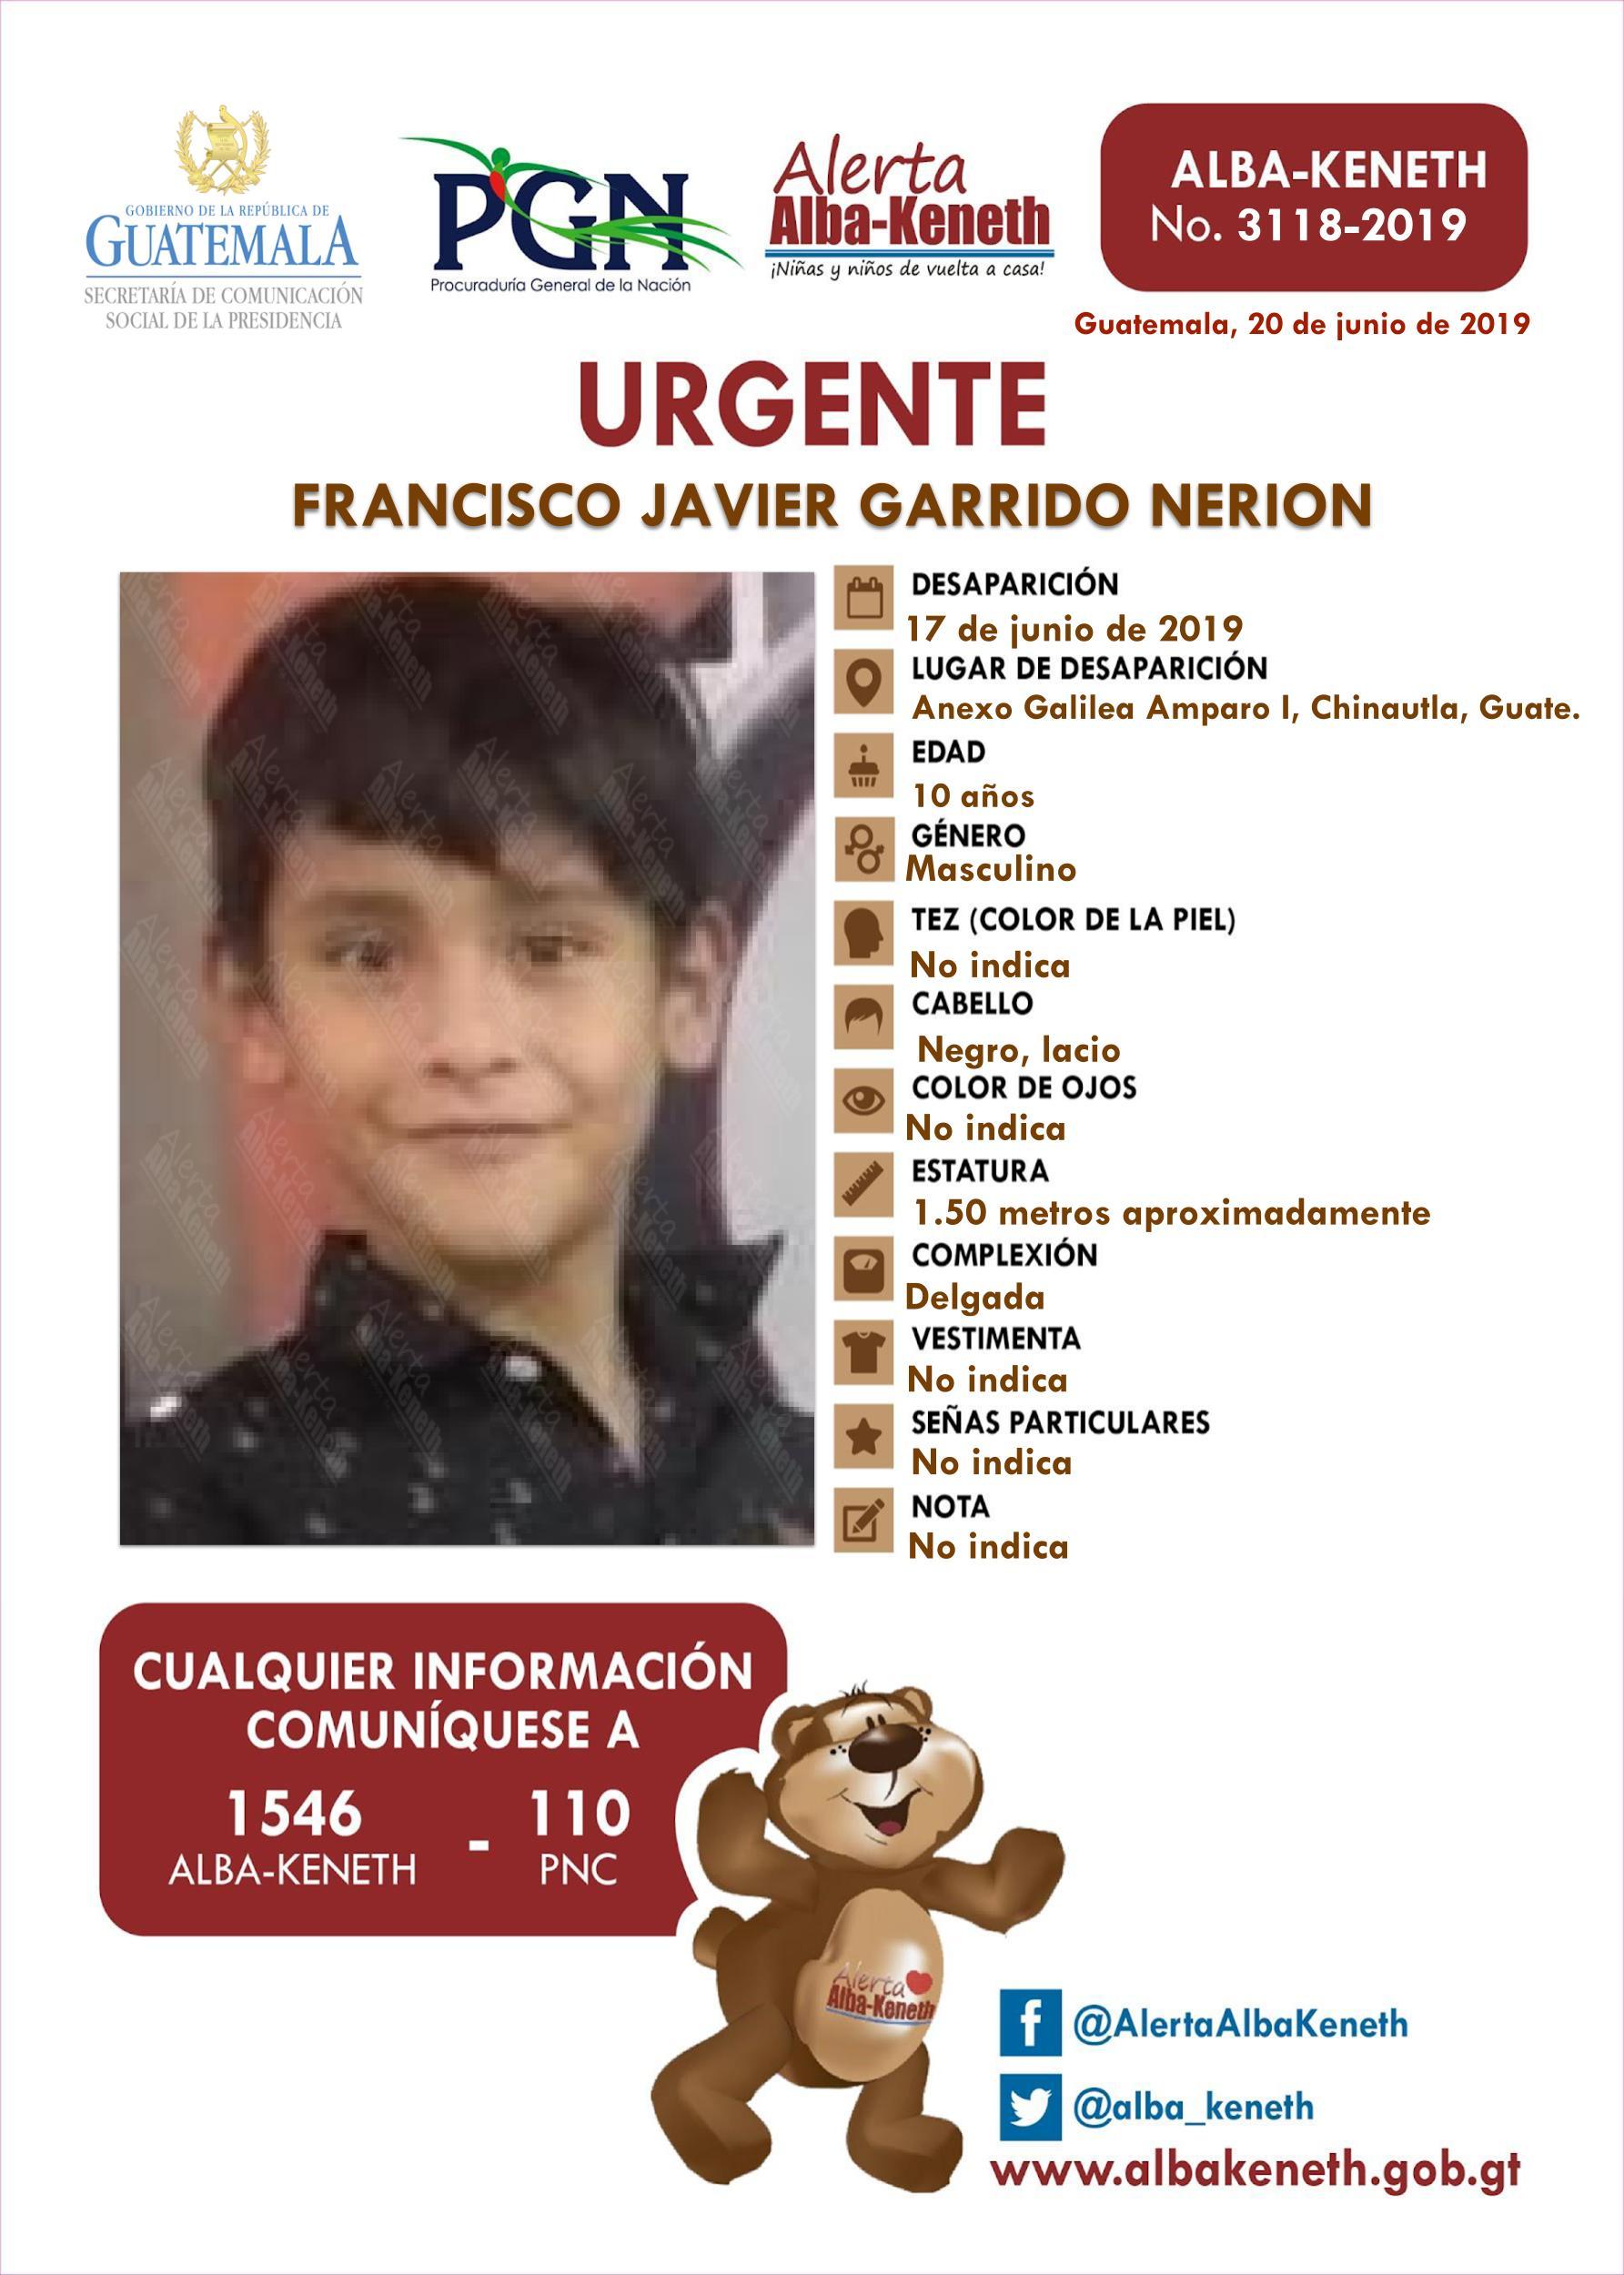 Francisco Javier Garrido Nerion